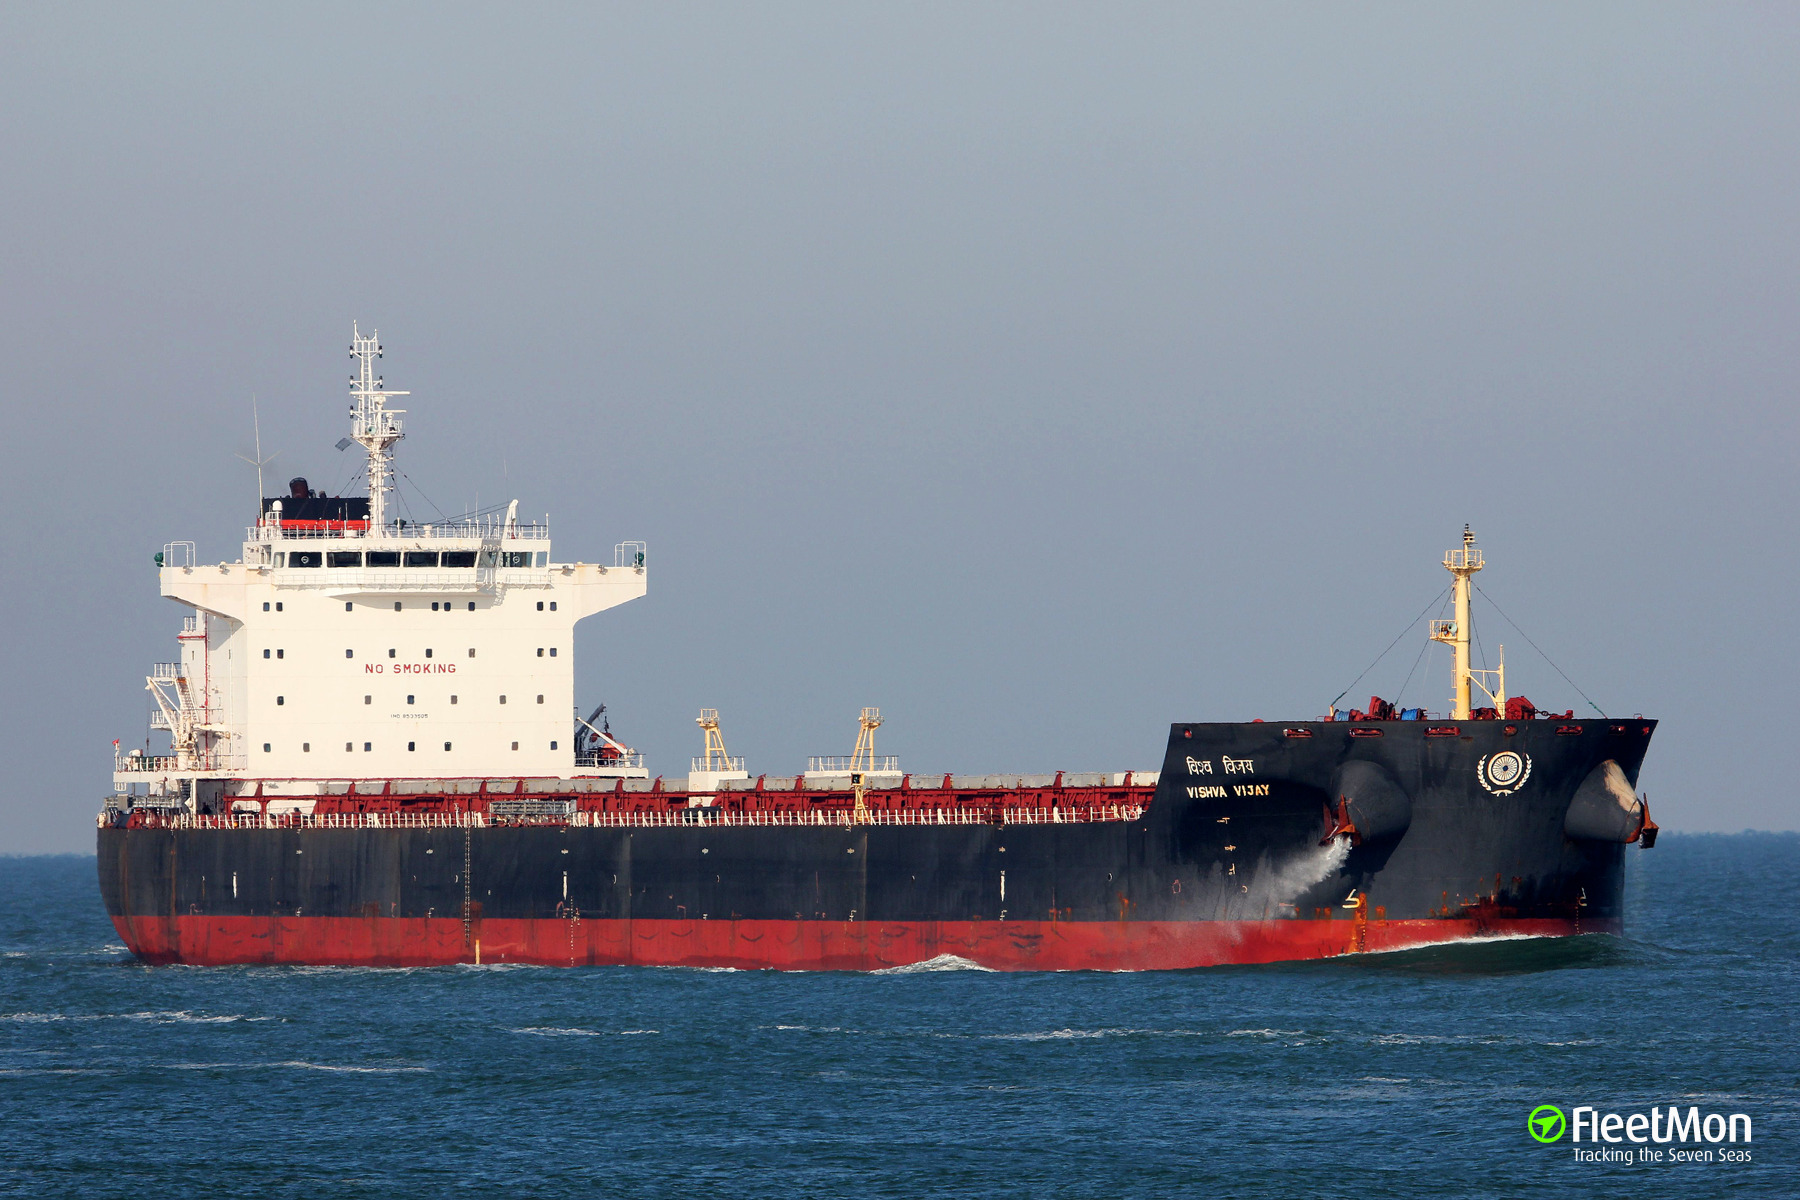 Indian panamax Vishva Vijay aground and refloated, Turkey